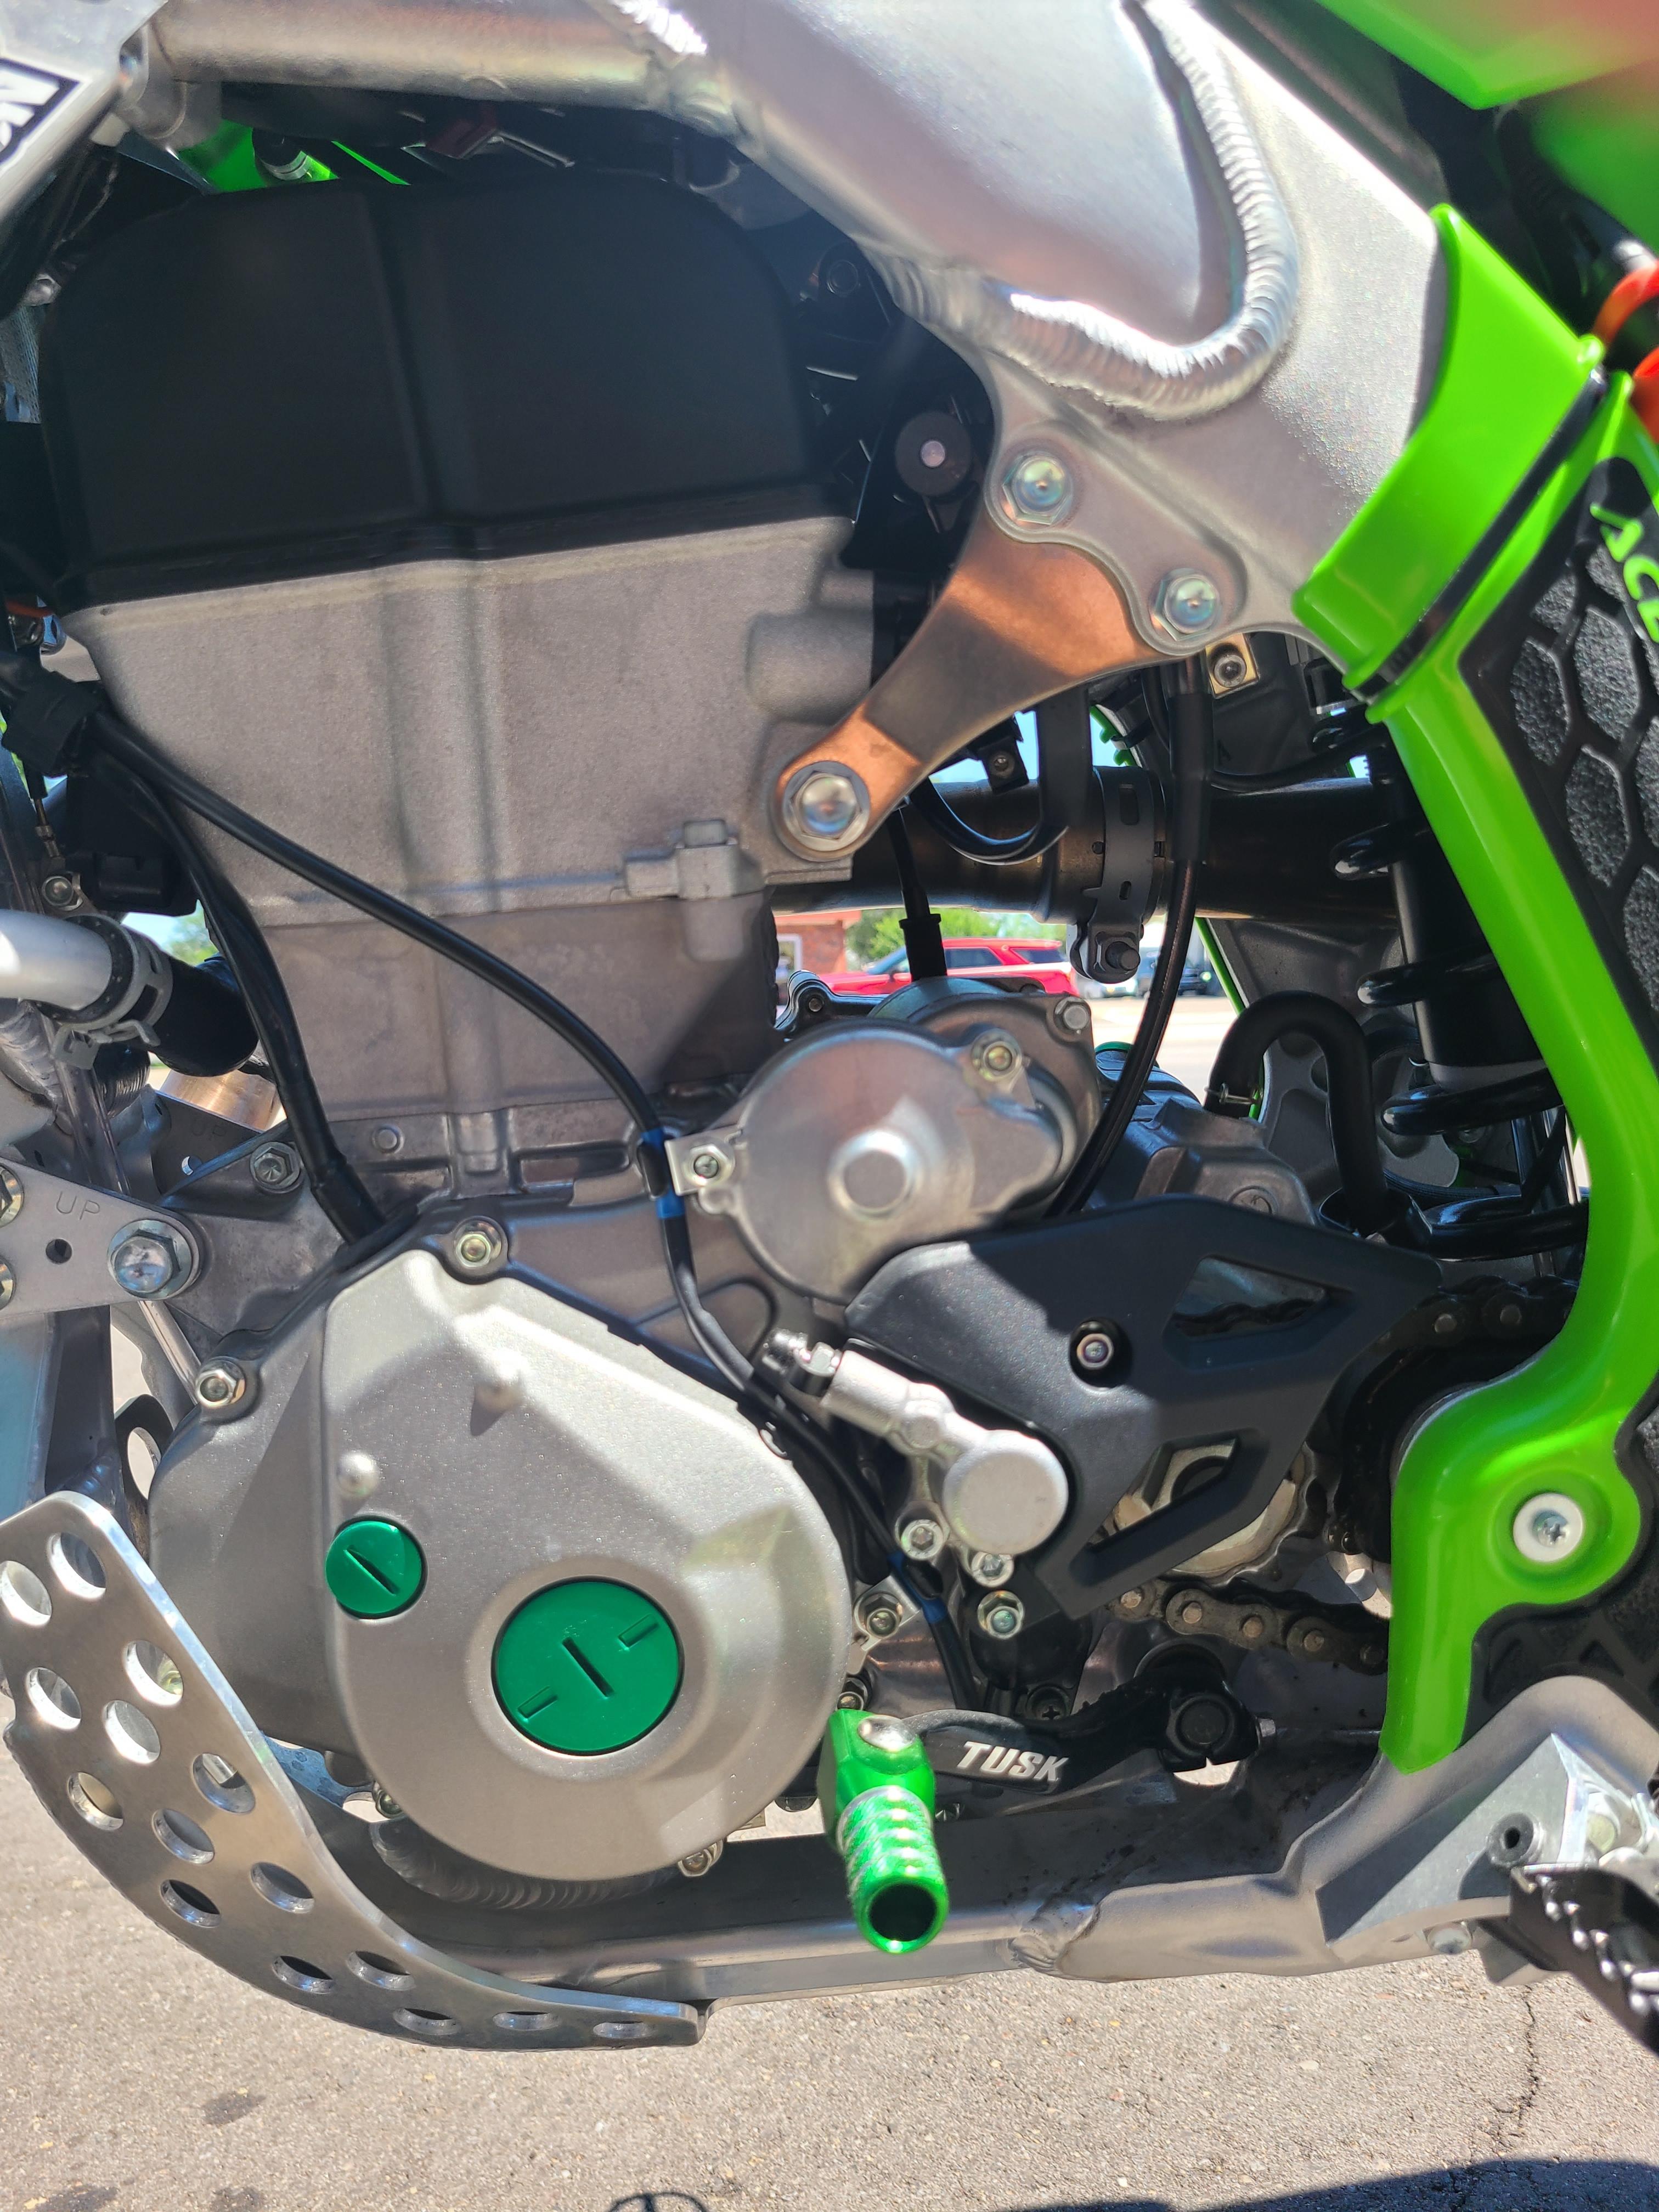 2019 Kawasaki KX 450 at Bobby J's Yamaha, Albuquerque, NM 87110